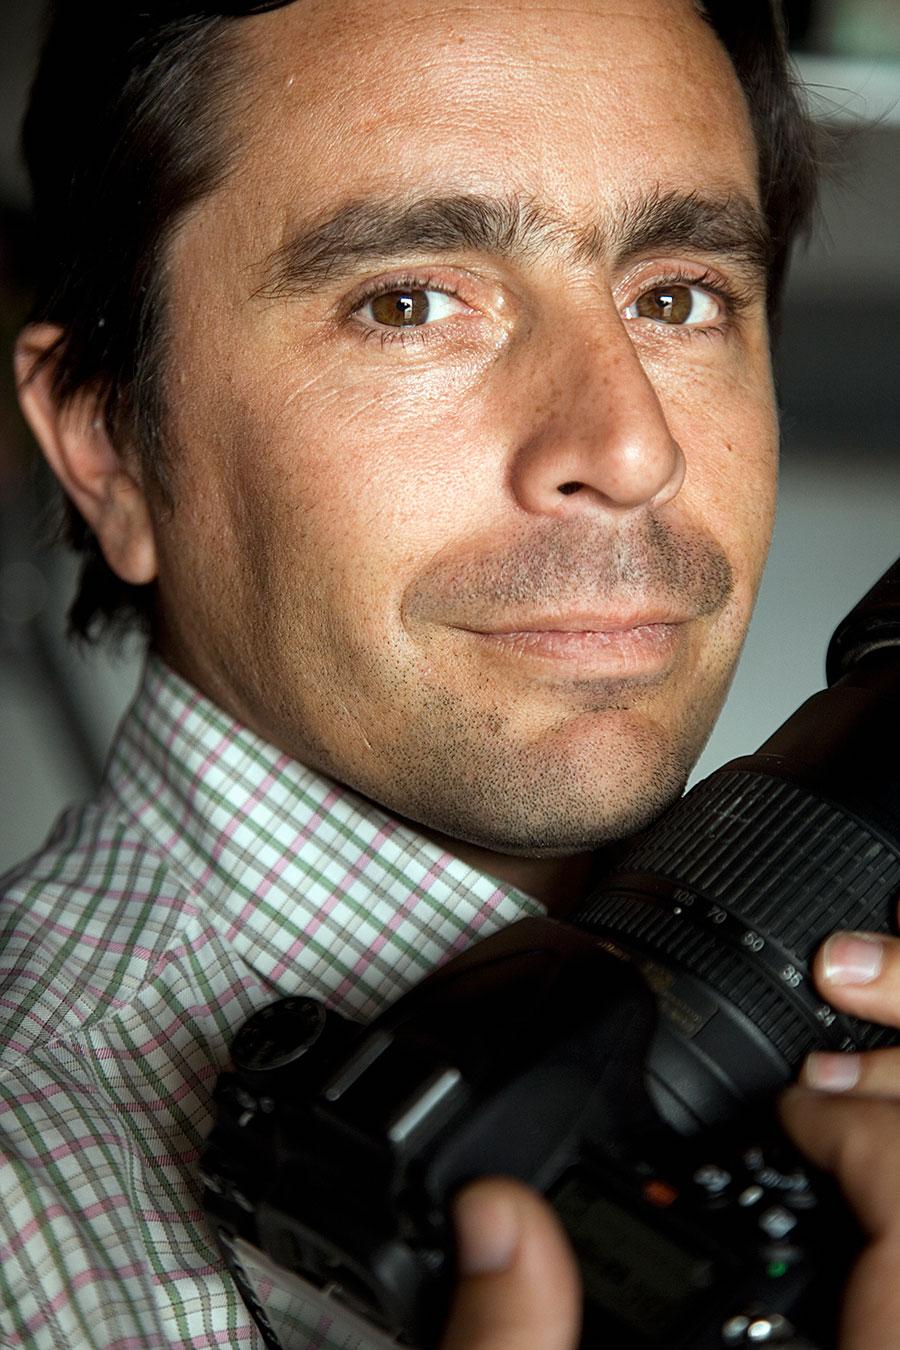 Josè Luis de la Escalera, co-owner